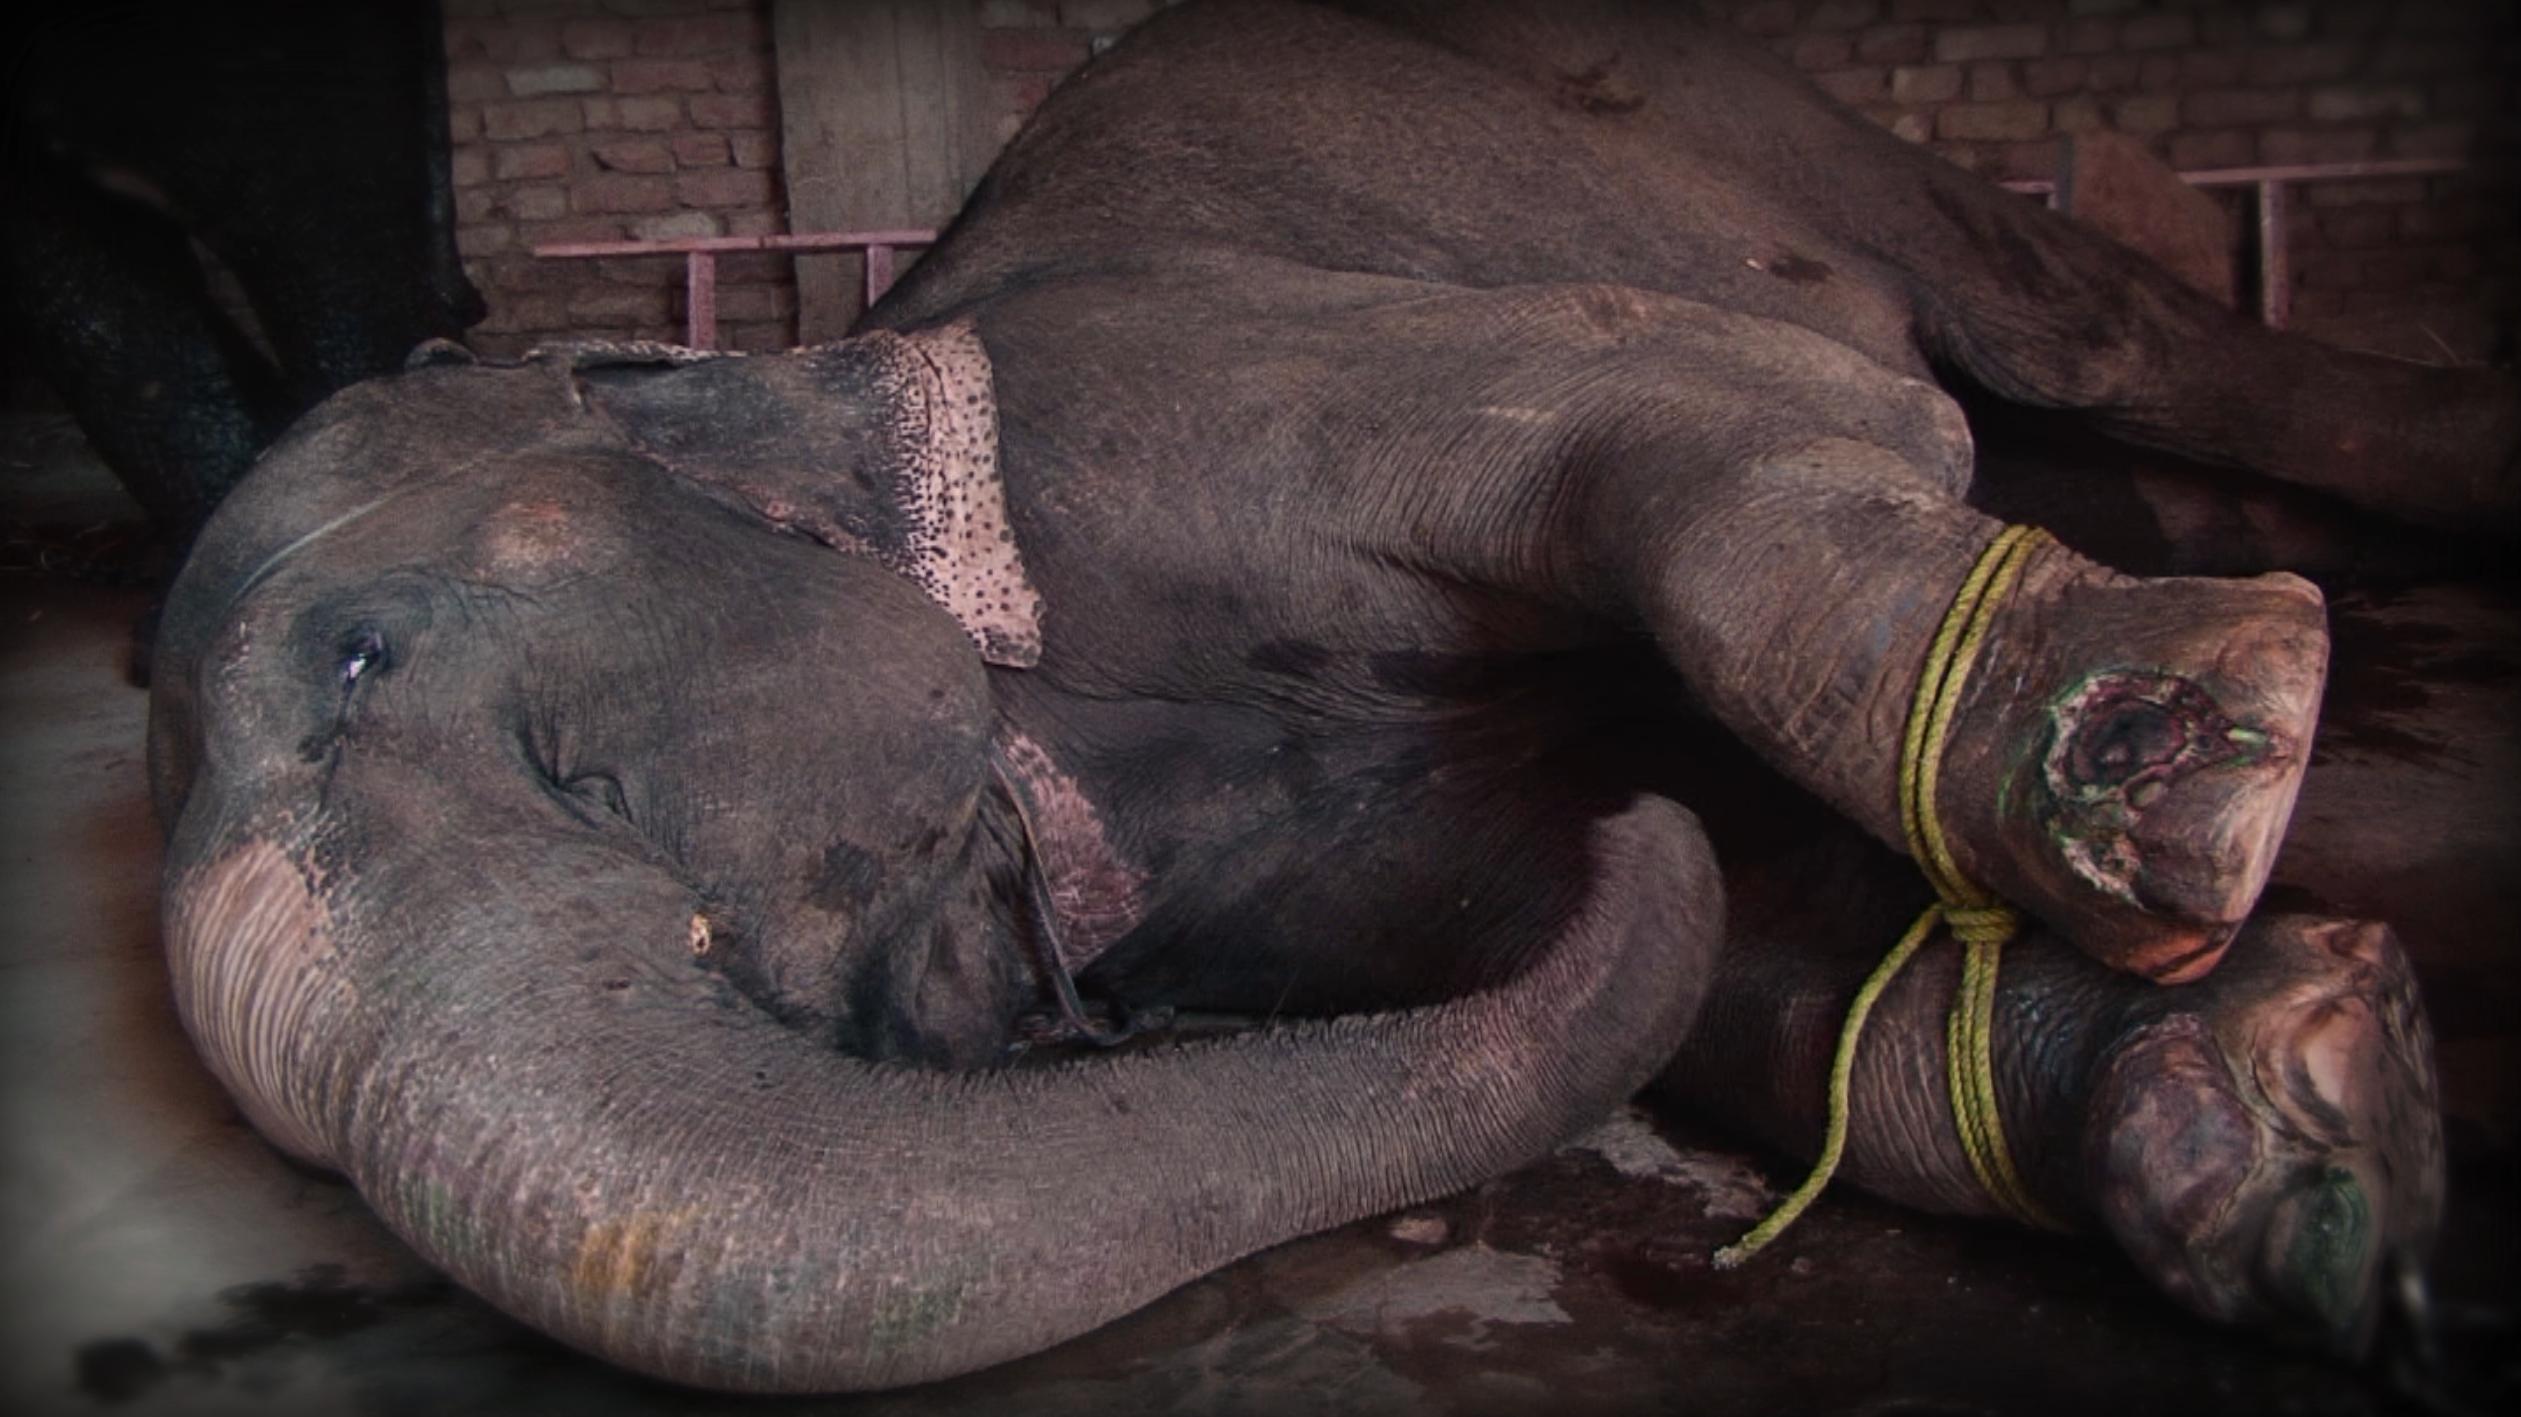 Ethical Bucket List warn of dark side of elephant rides